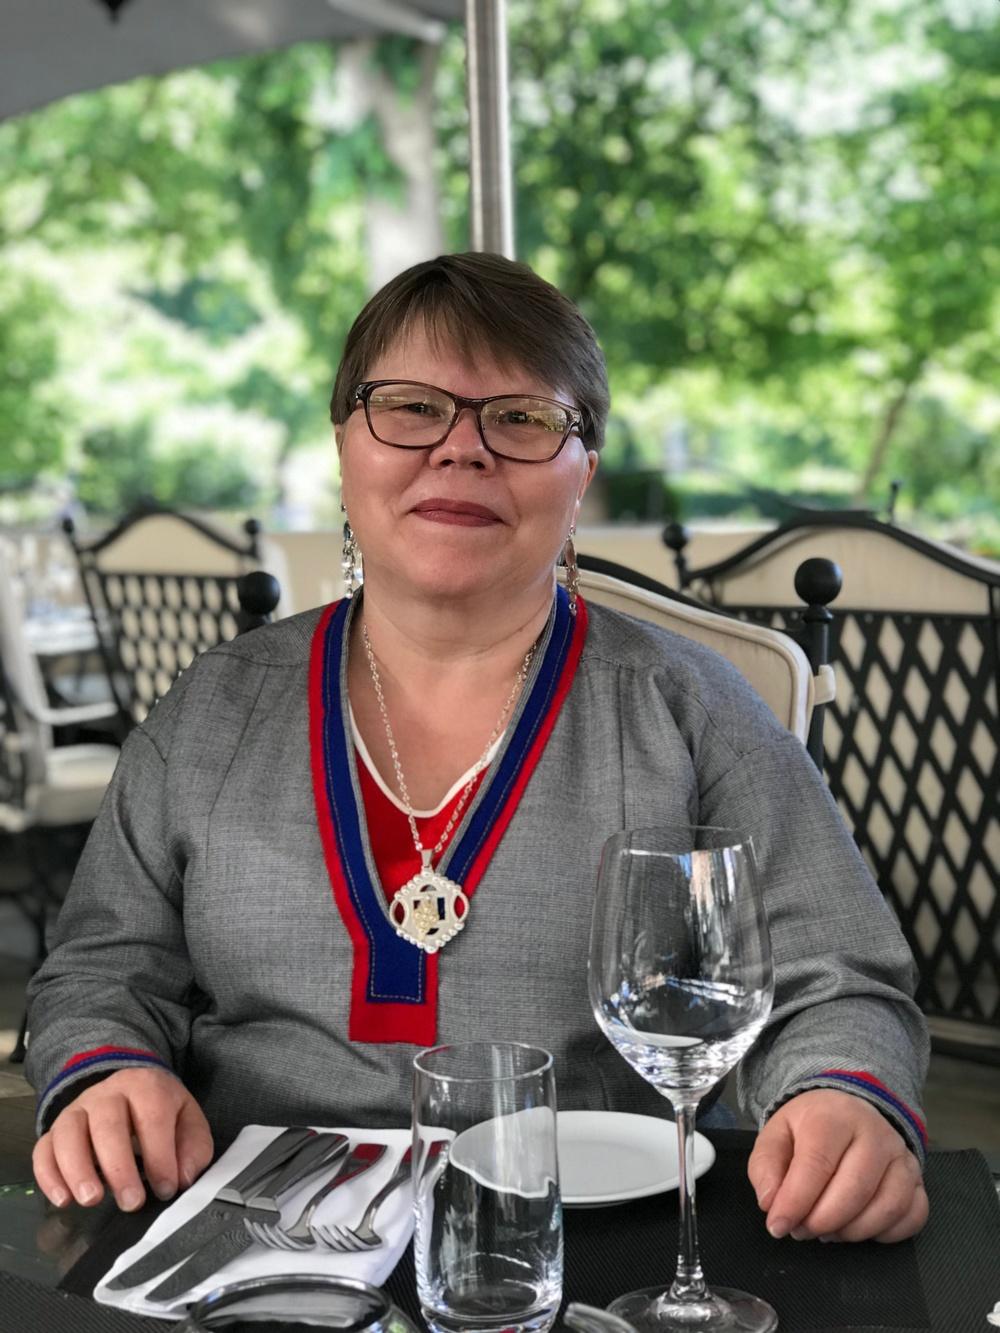 Katarina Pirak Sikku Fotograf: Katarina Spiik Skum